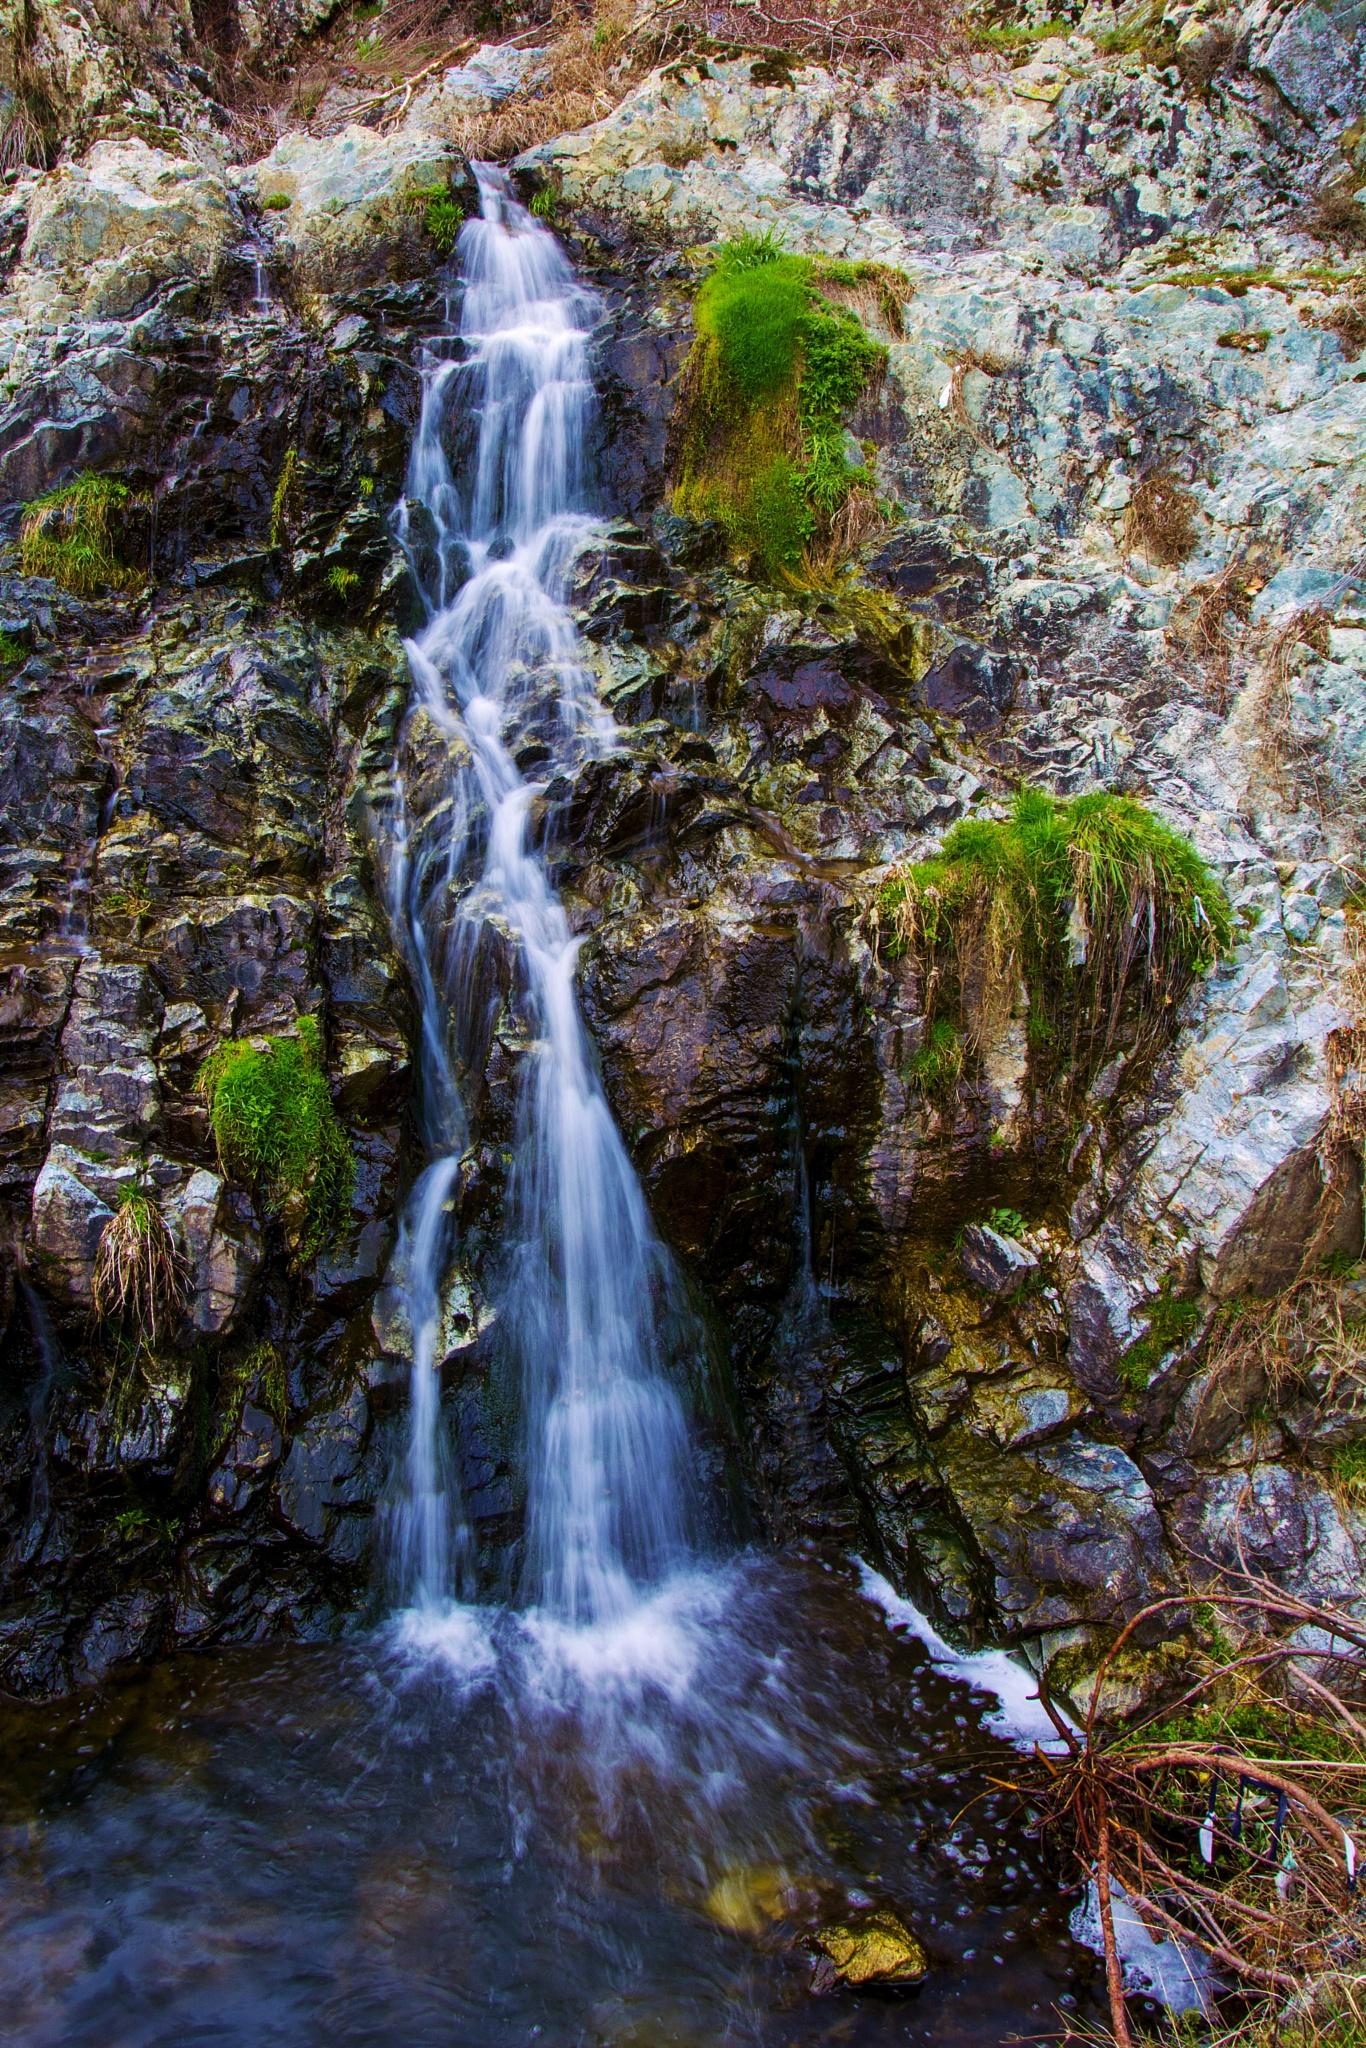 waterfall from Startcevo village (Zlatograd) by Genadiy Boyanov